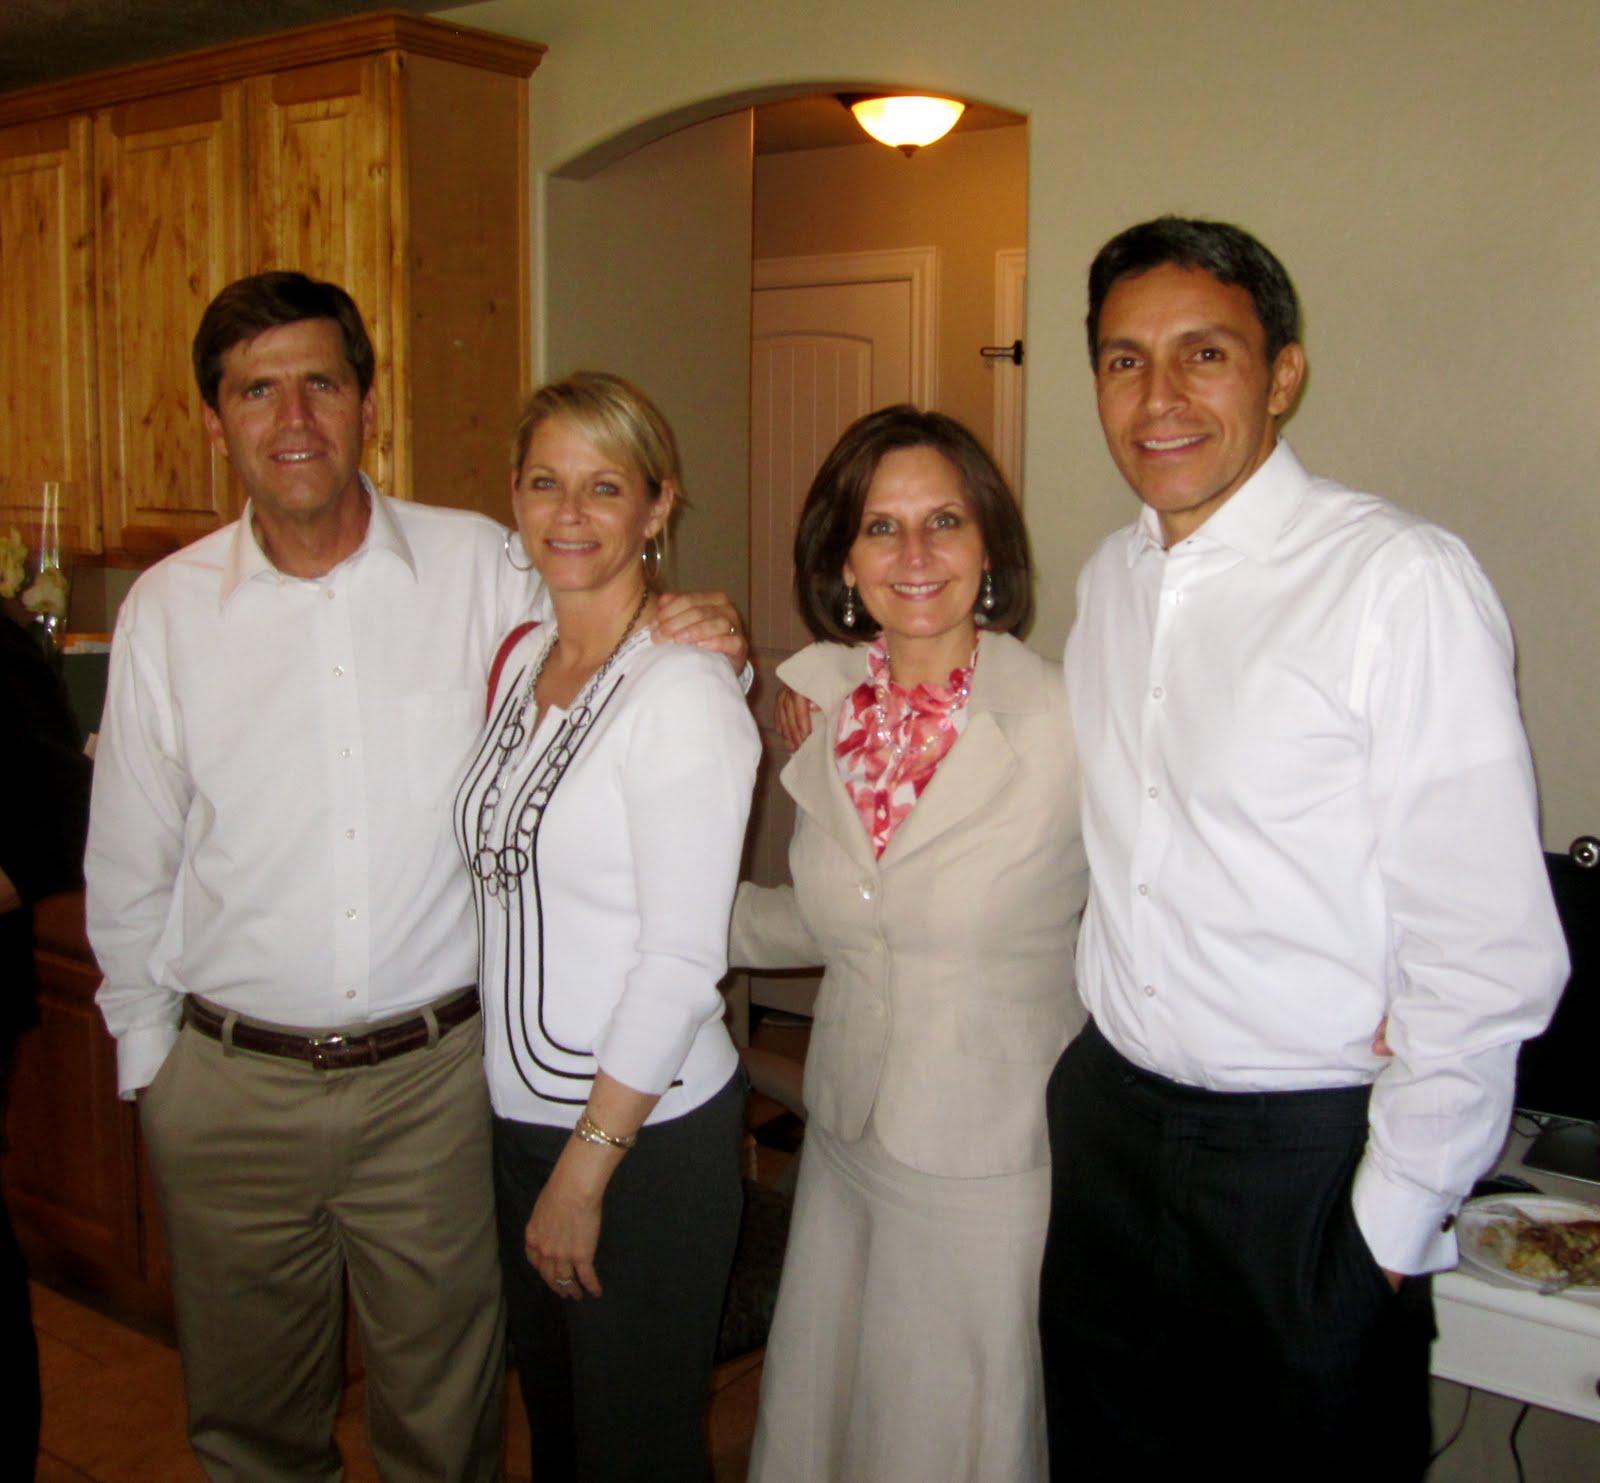 Wife Jacob Rascon Family Www Picsbud Com